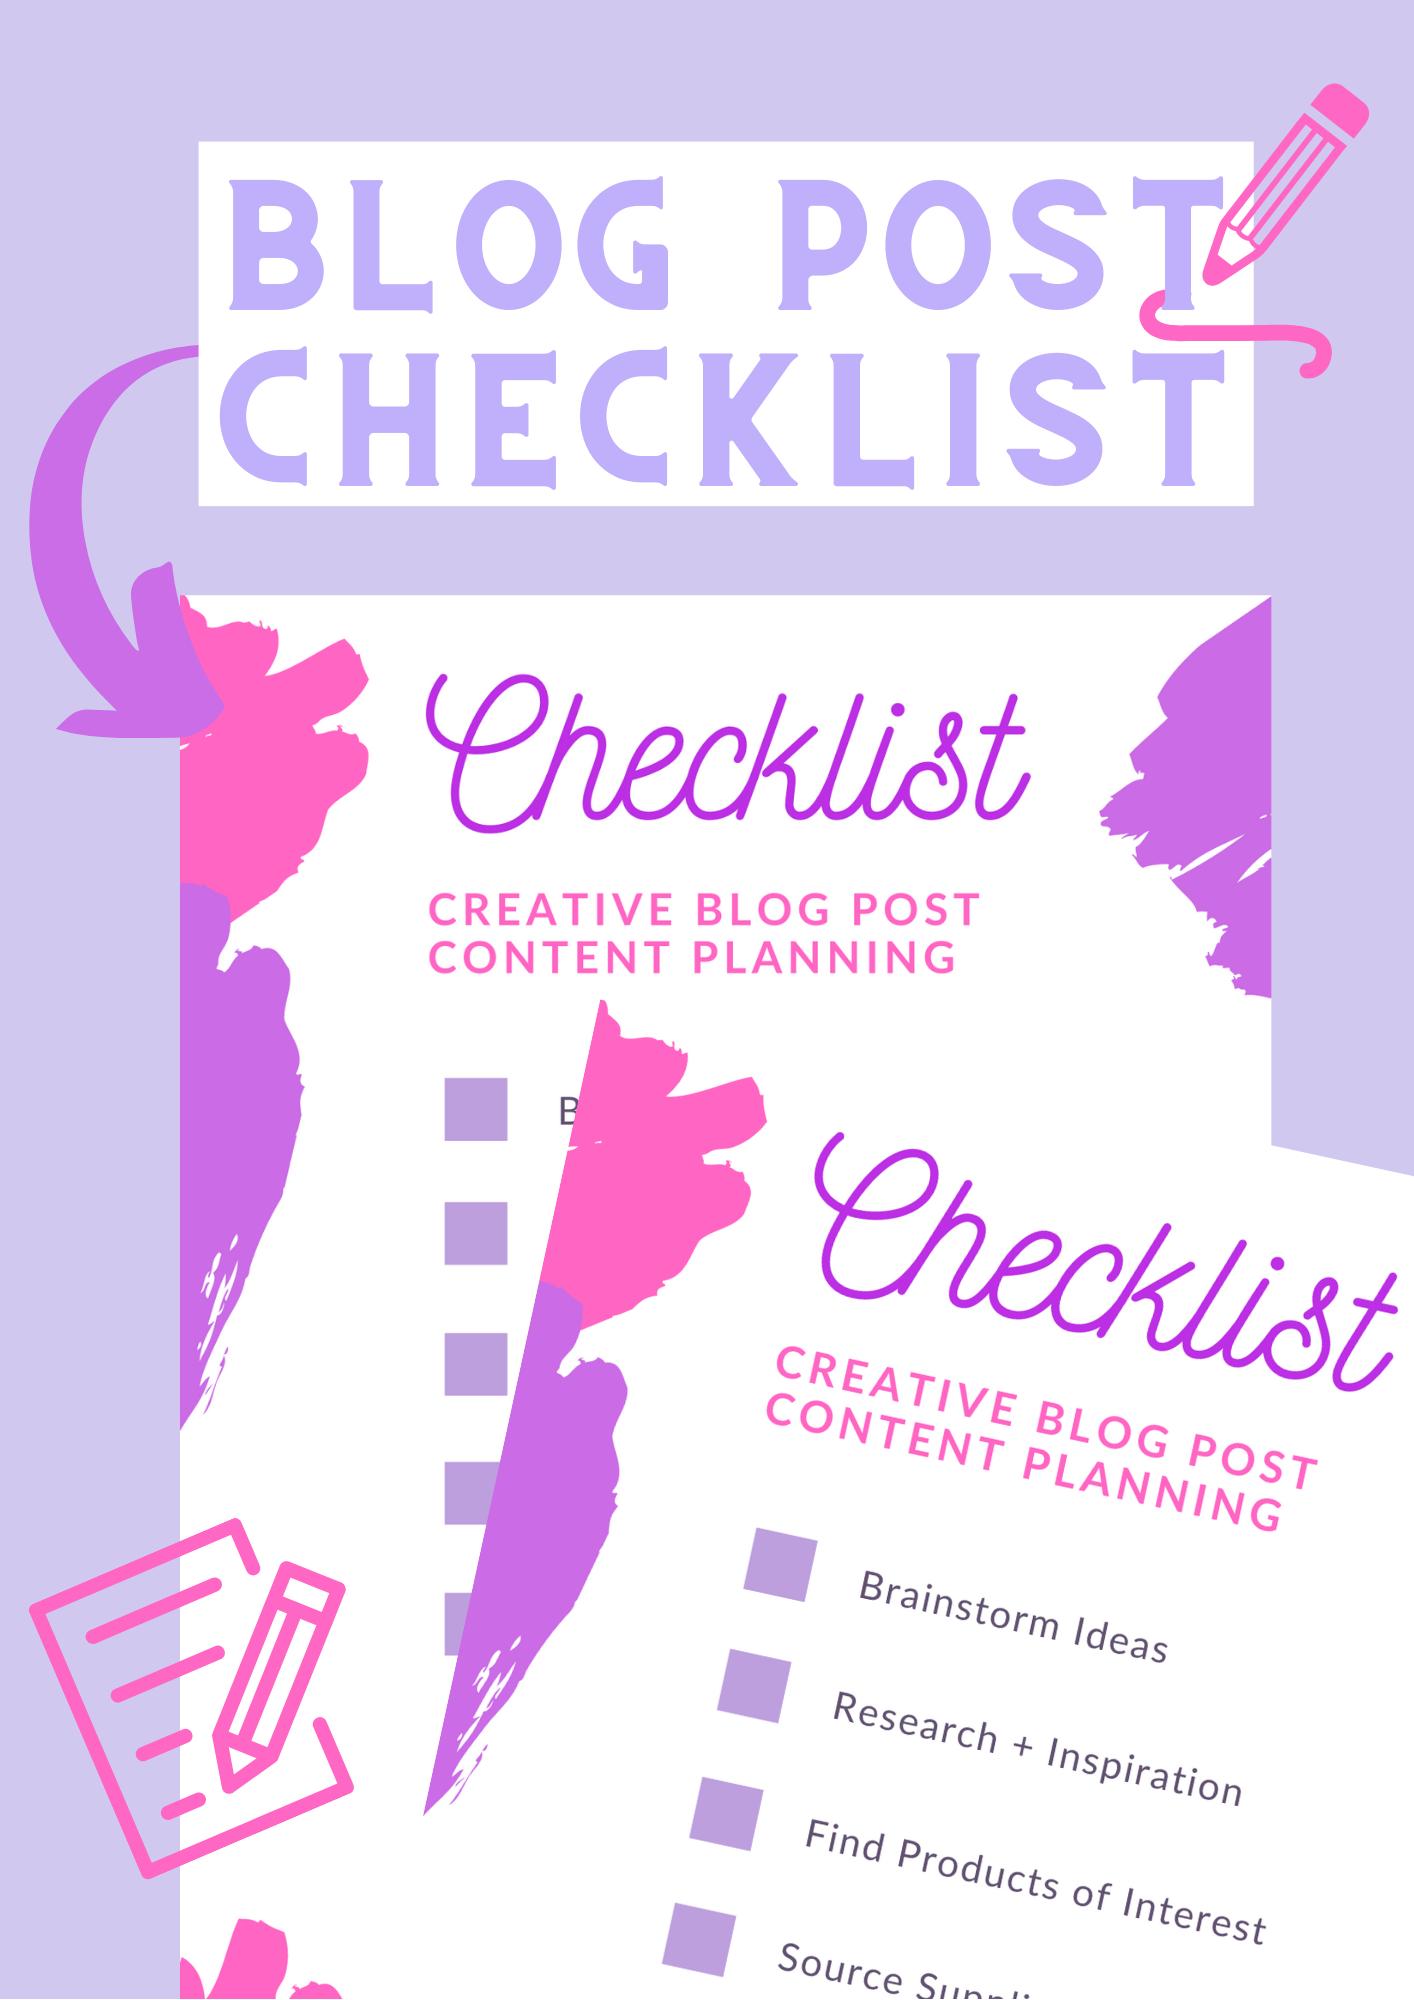 creative blog post checklist promotional graphic